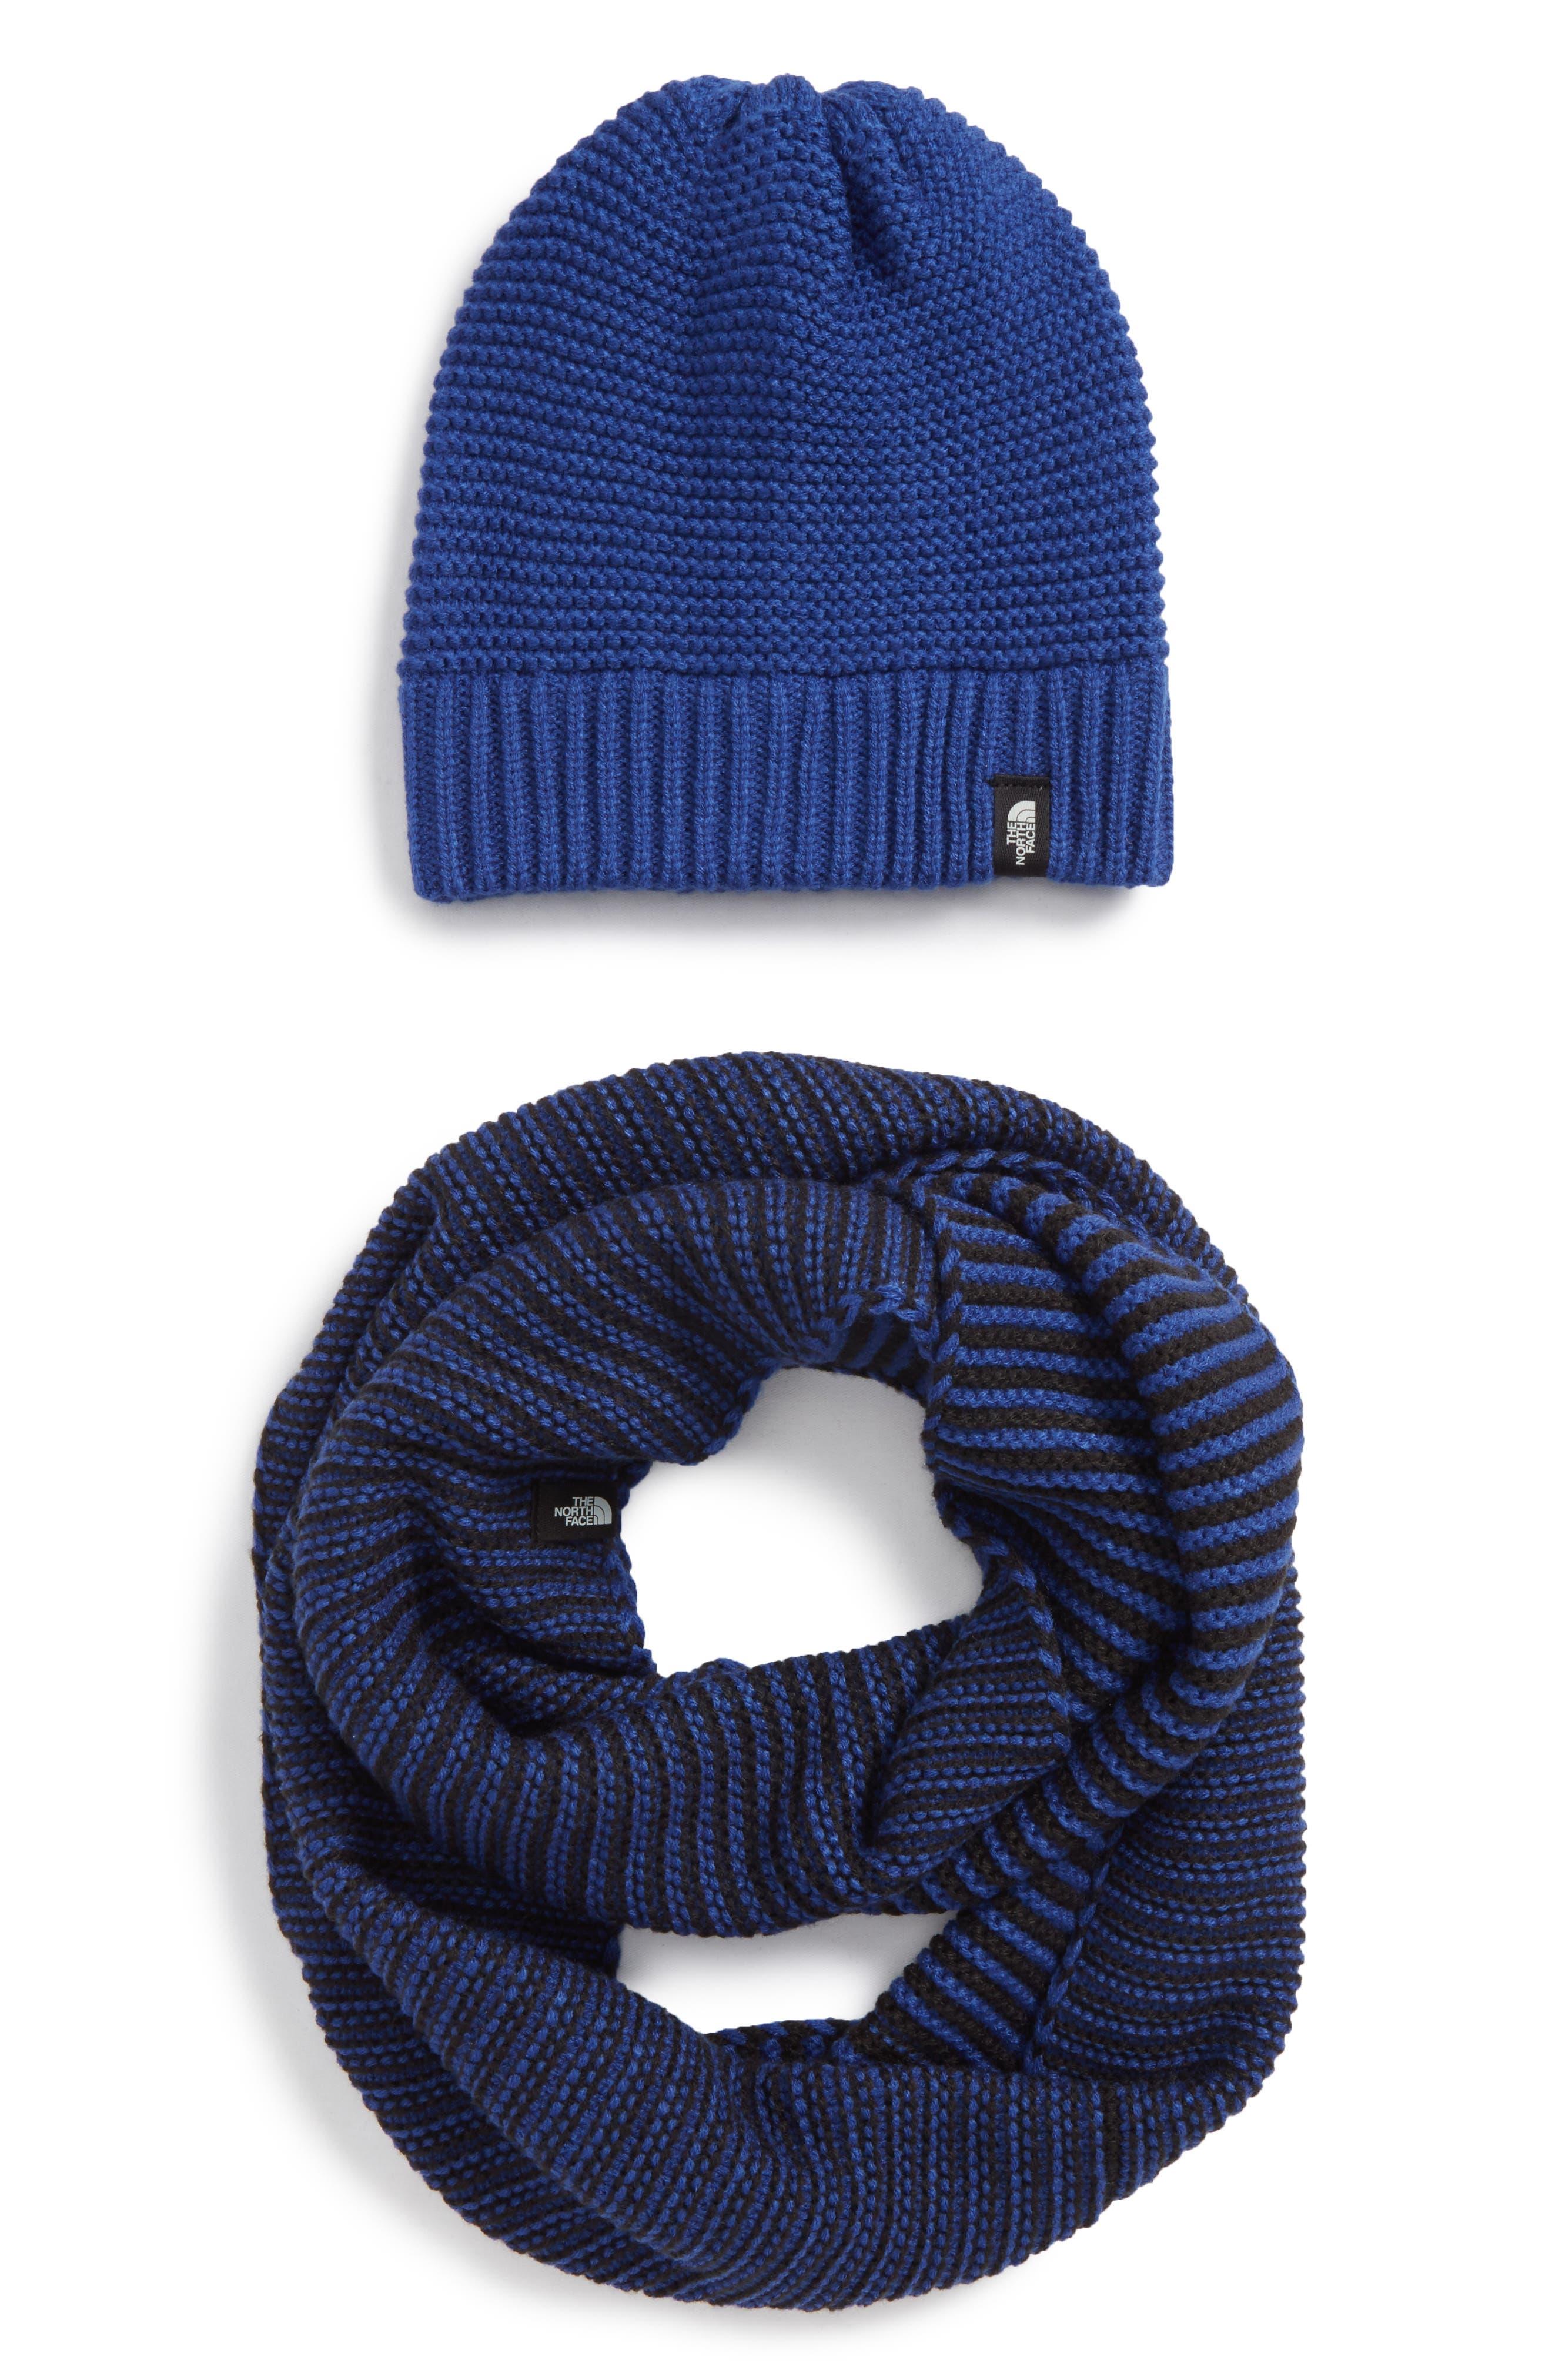 Purrl Stitch Beanie & Infinity Scarf Set,                         Main,                         color, Brit Blue